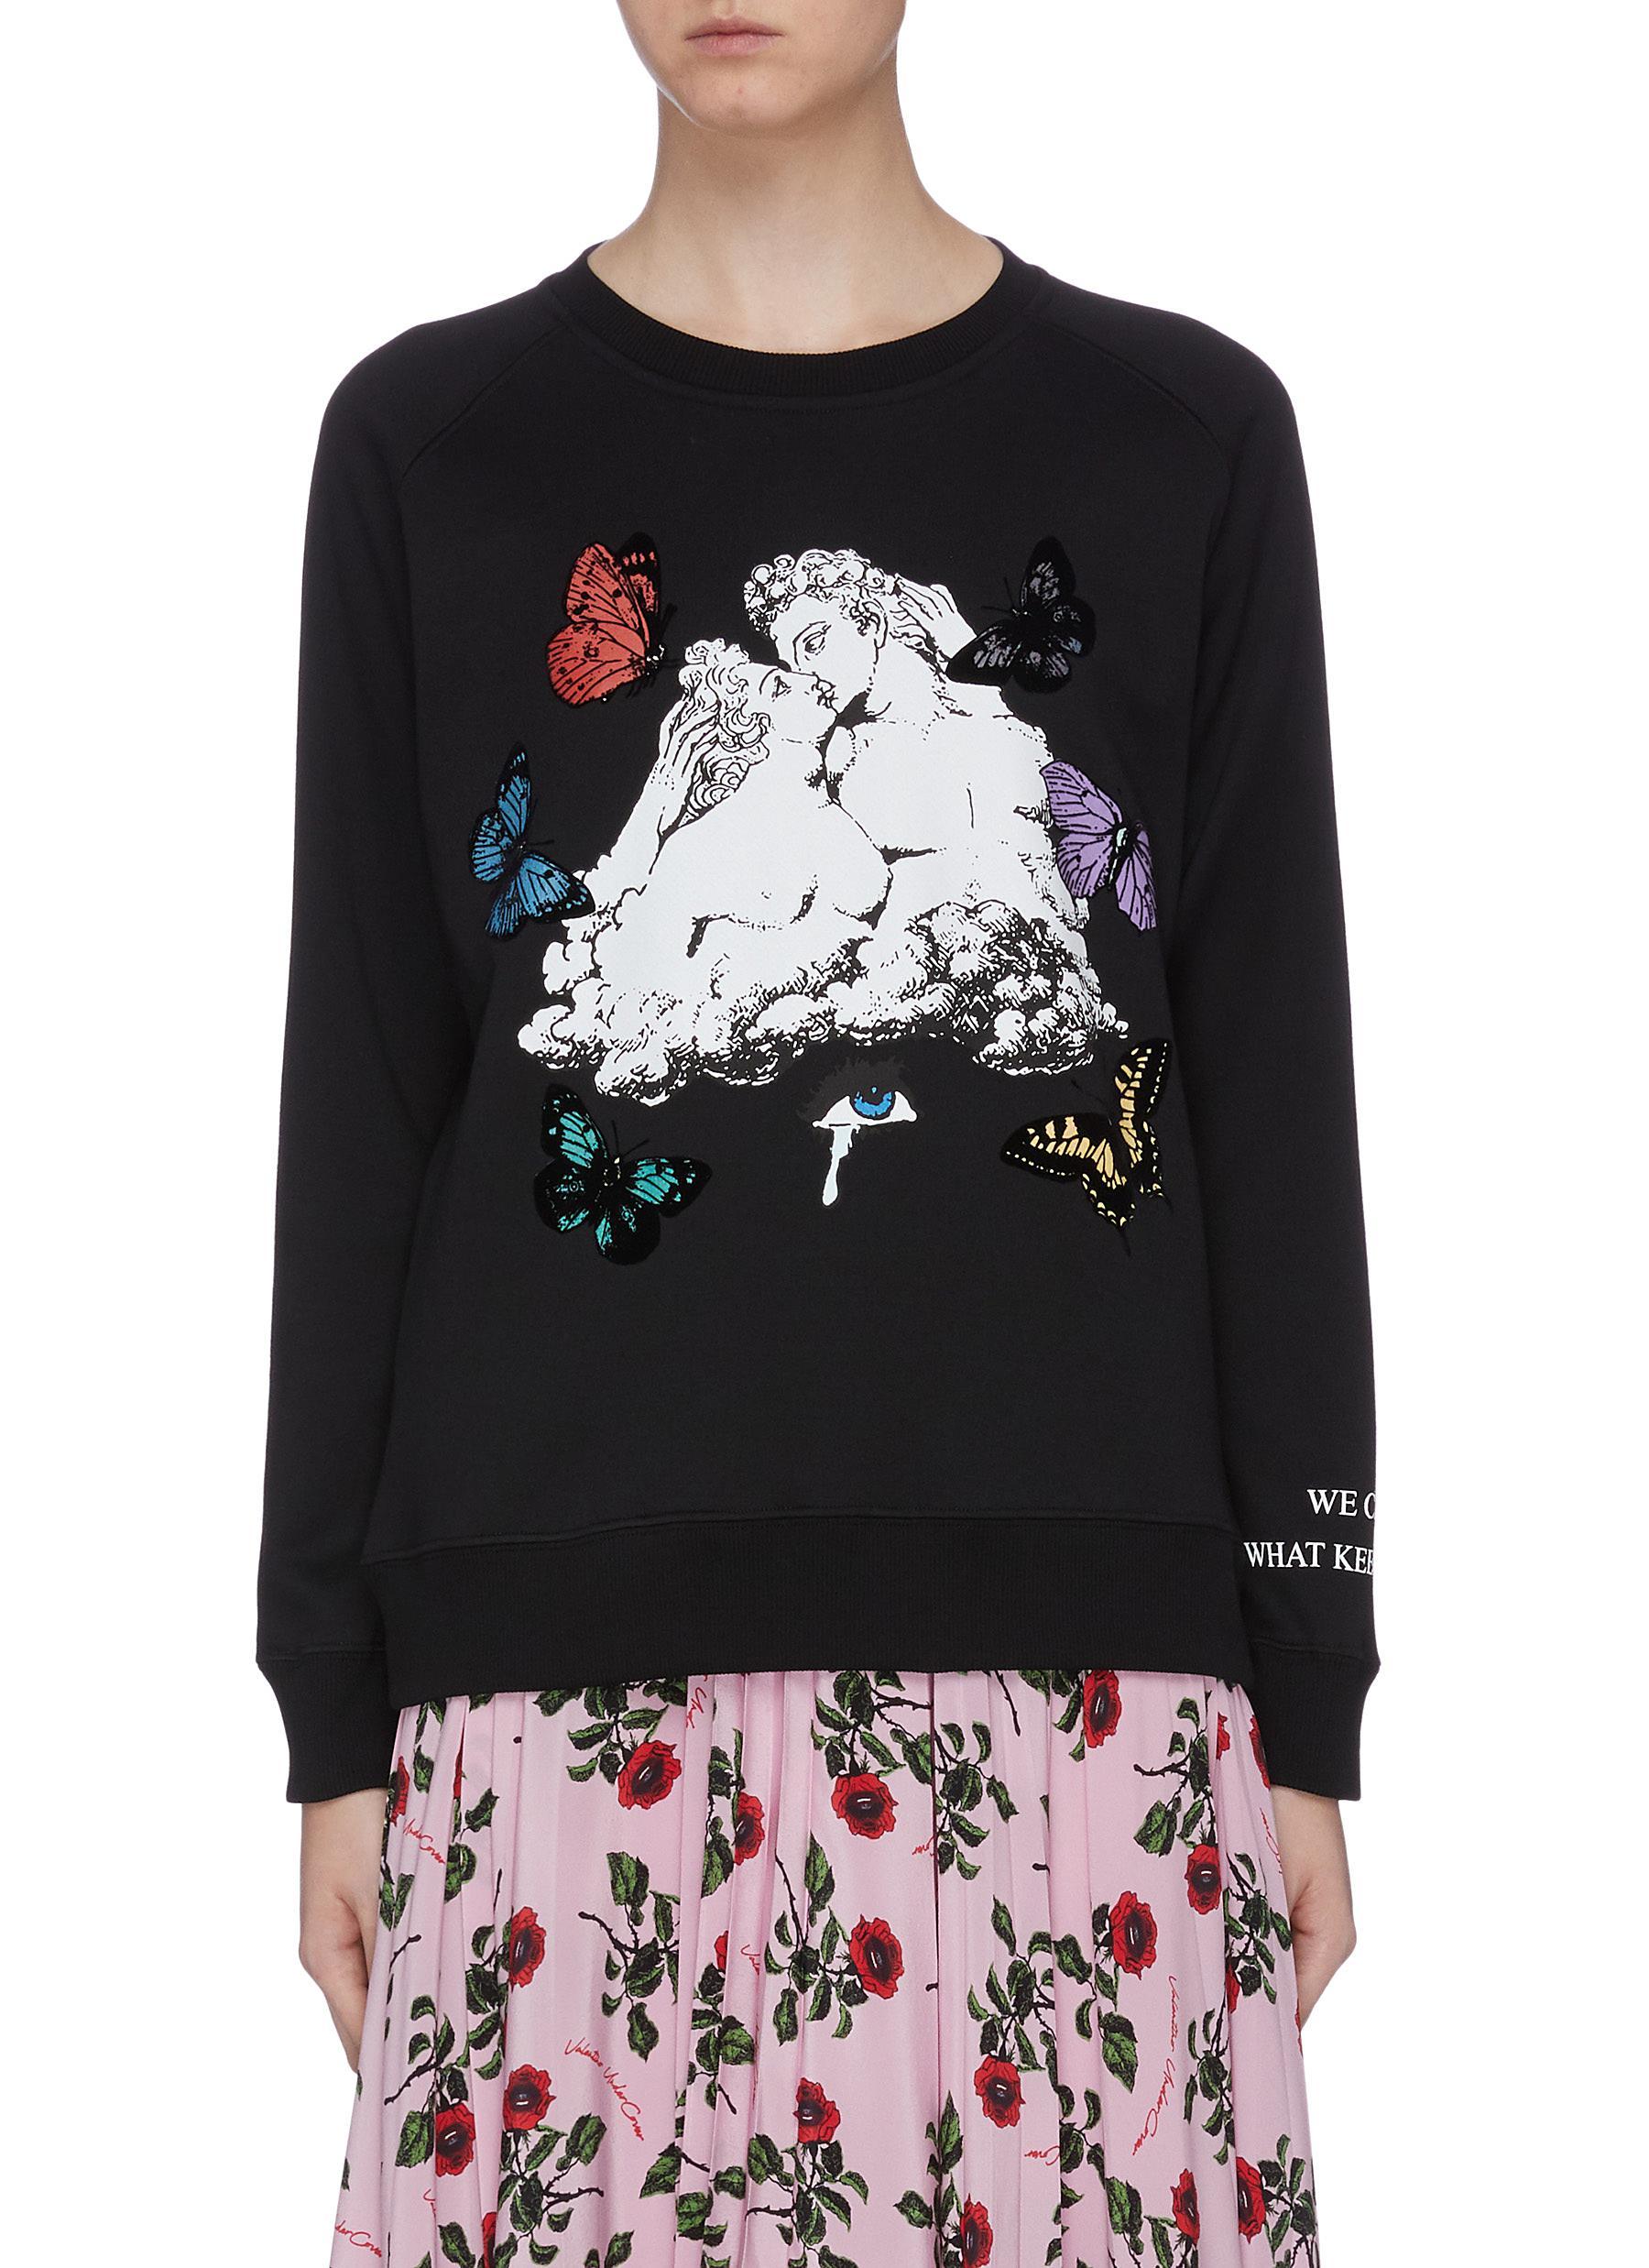 x UNDERCOVER lovers slogan print sweatshirt by Valentino